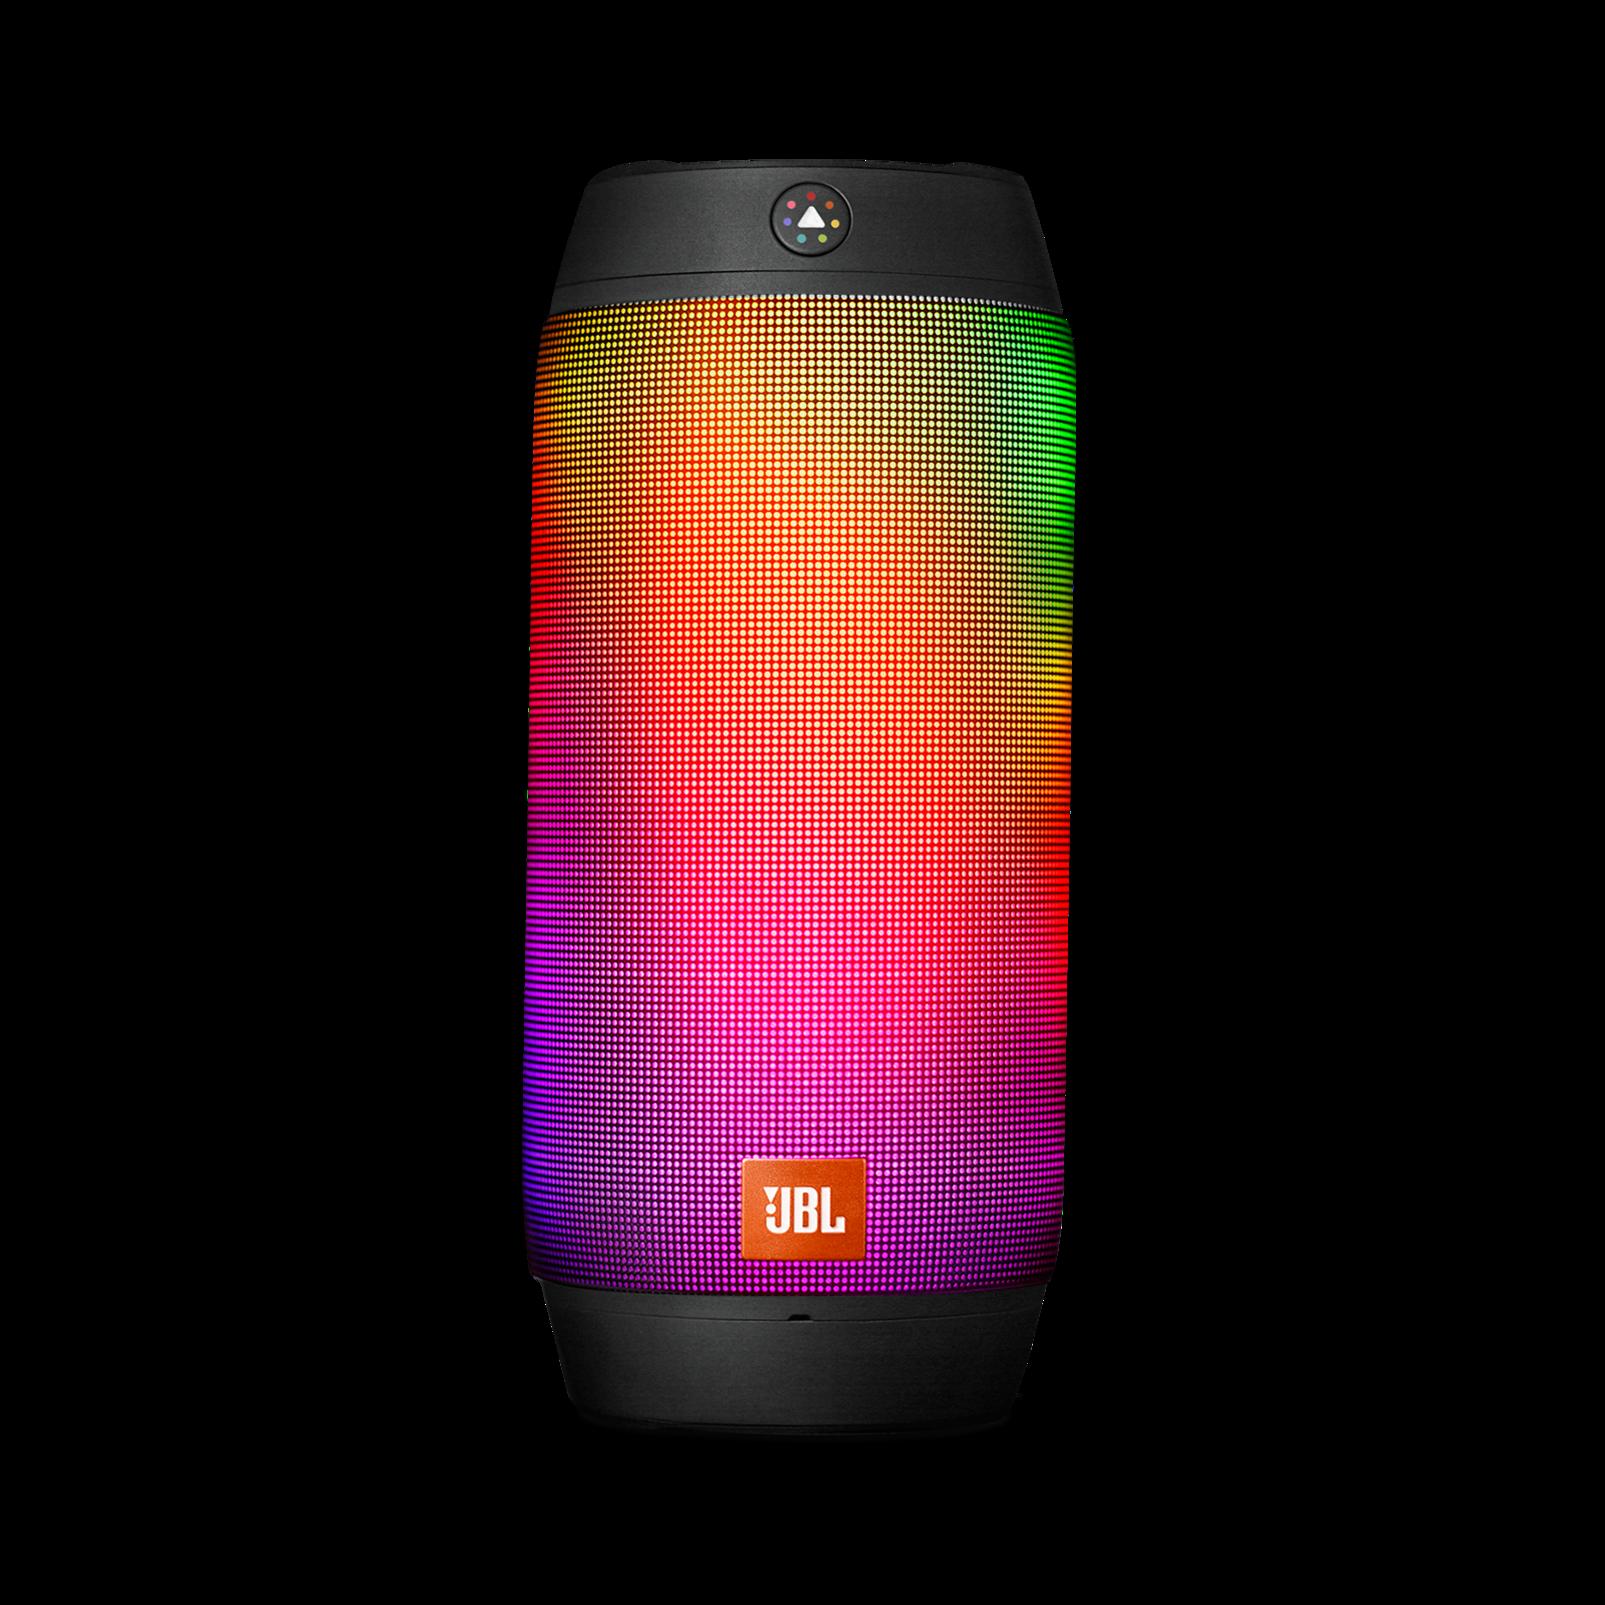 jbl speakerss. jbl pulse 2 | splashproof bluetooth speaker with light show jbl speakerss